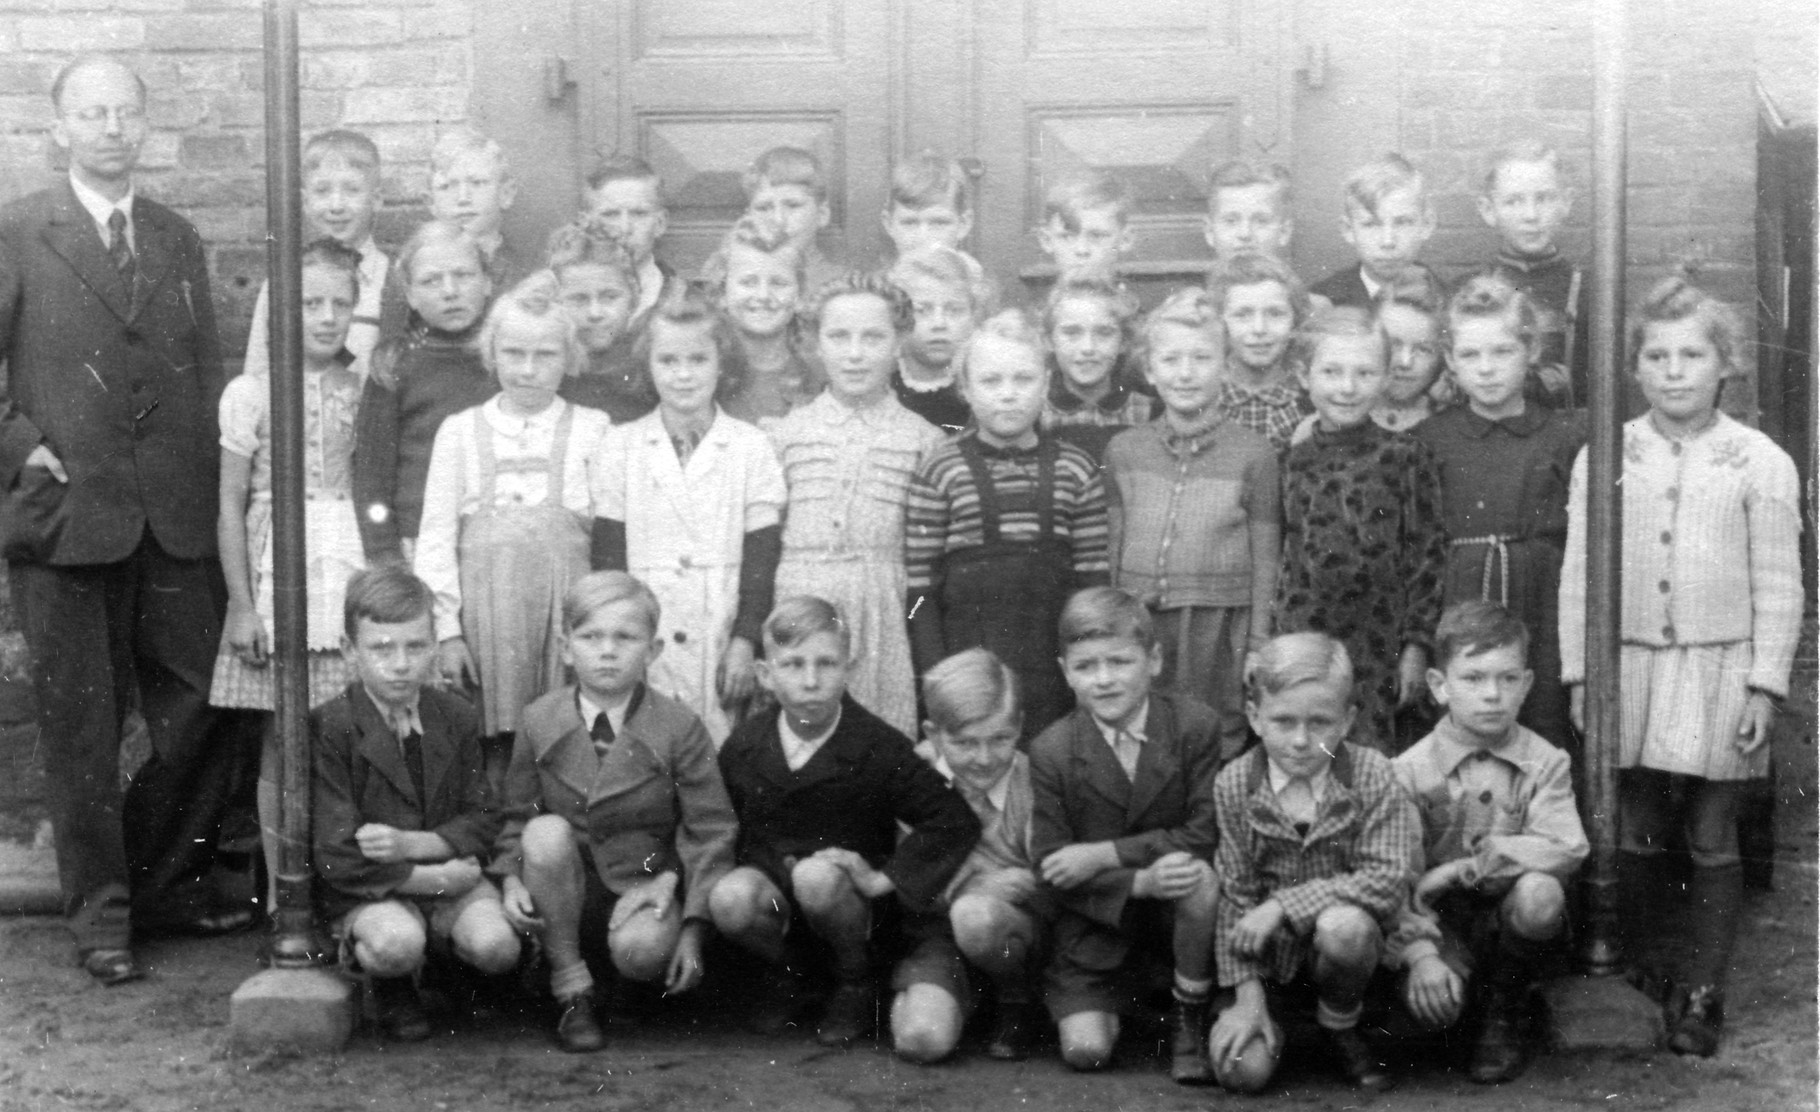 Jahrgang 1938, Bild: Weimar, Else geb. Bruder